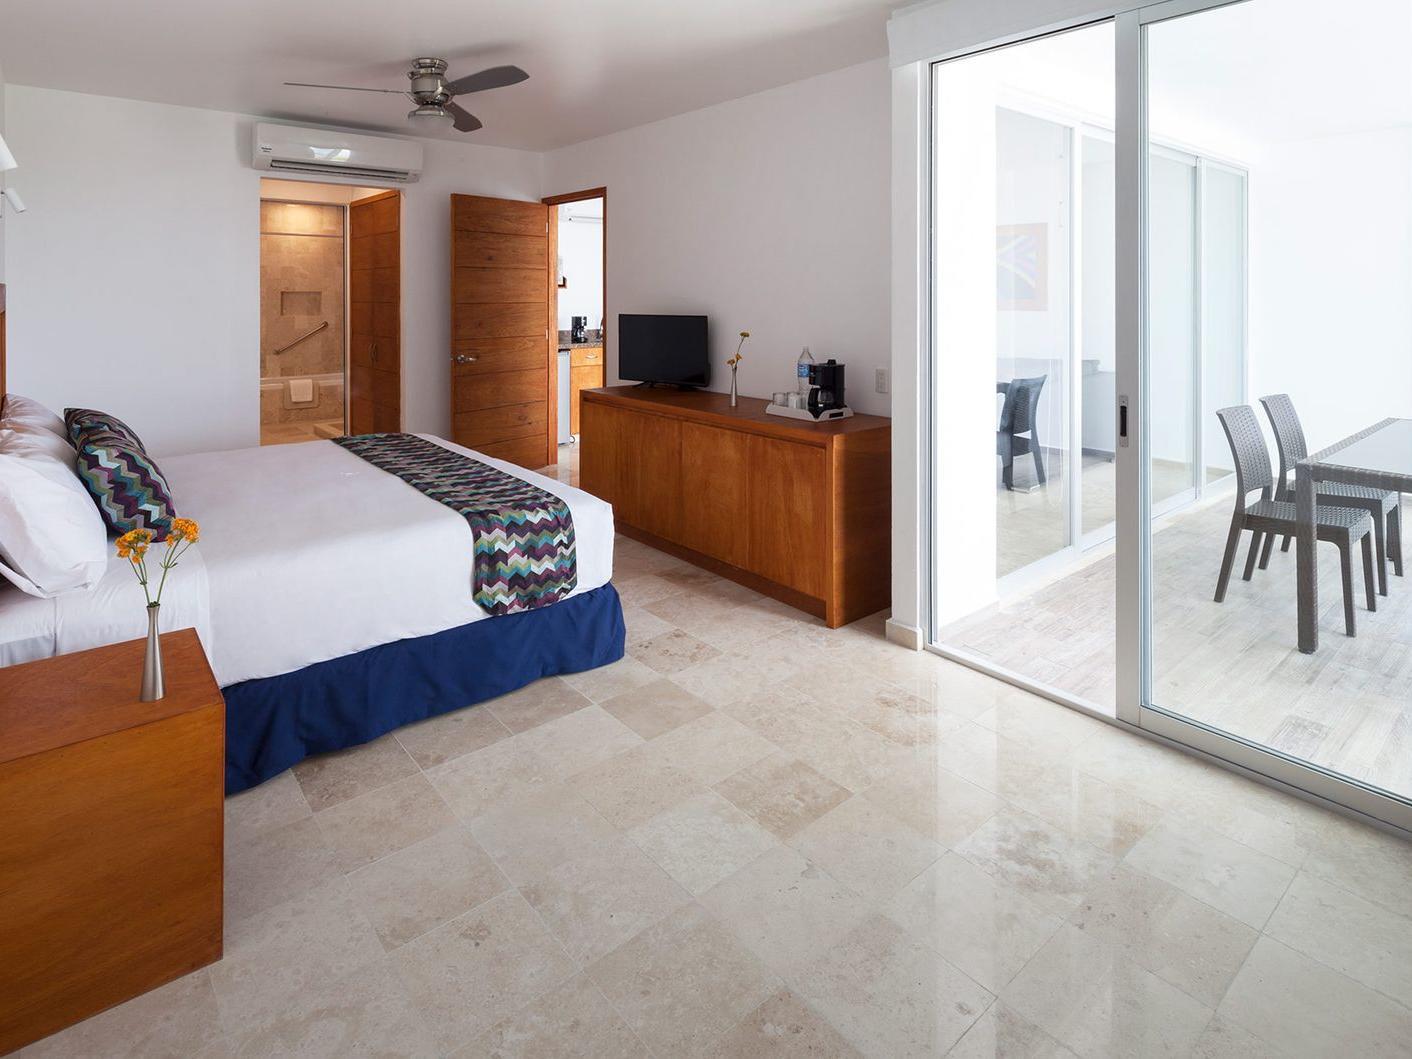 Suites hotel villa varadero